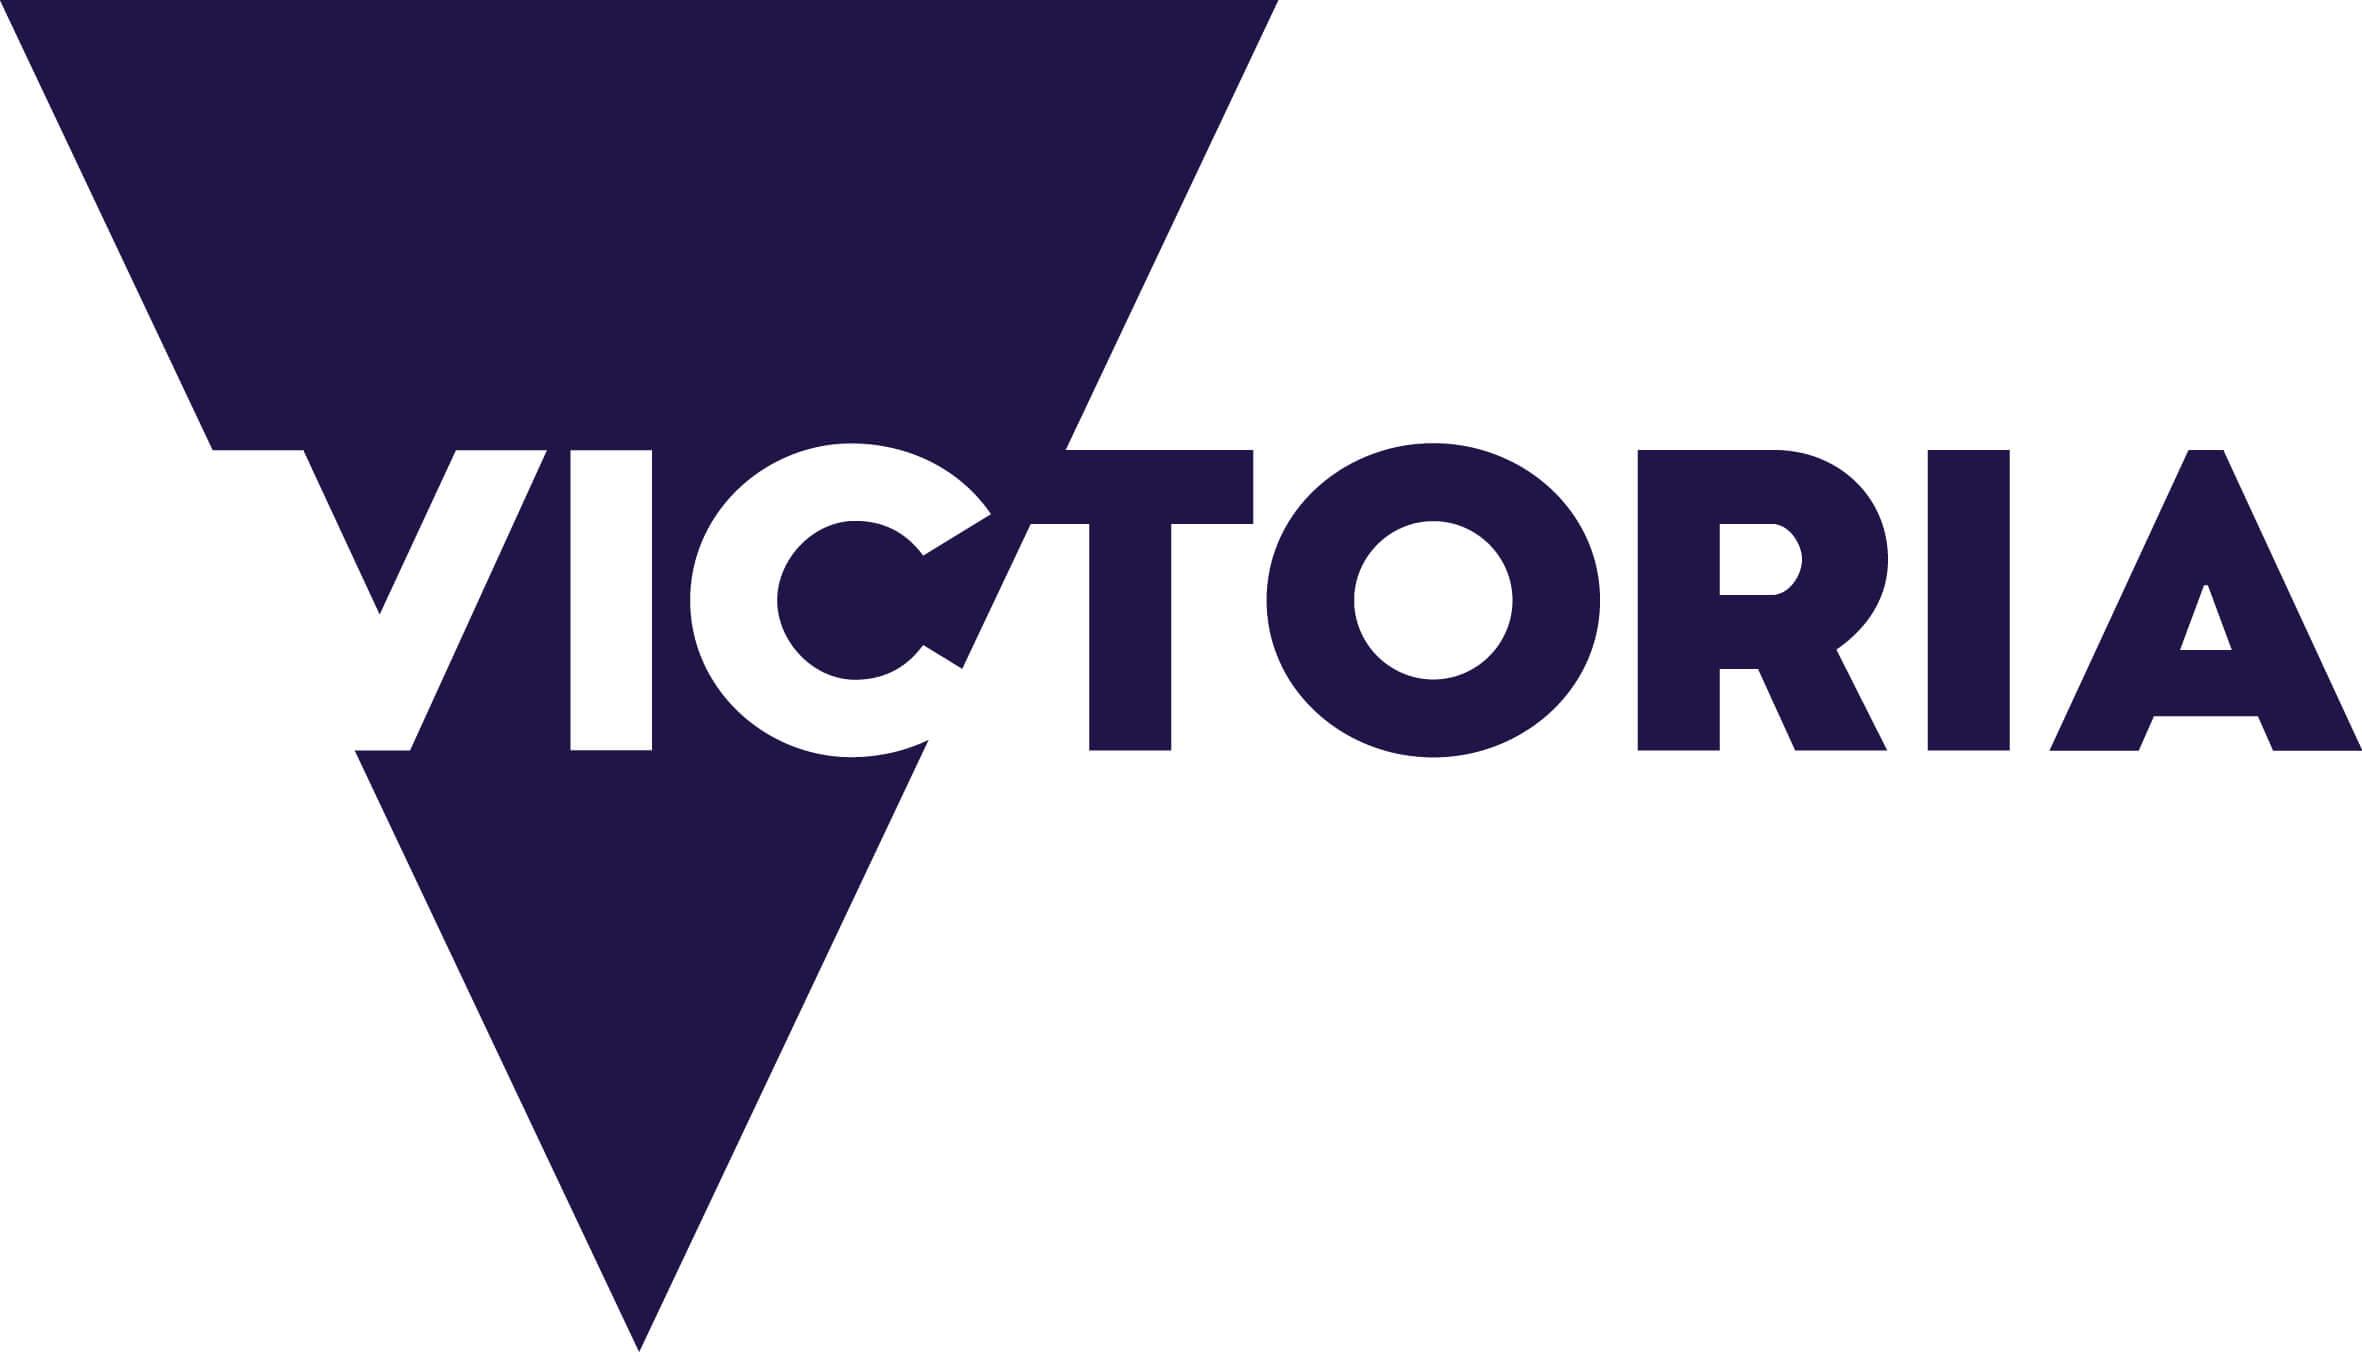 Victoria-Logo-pms-2765-rgb.jpg